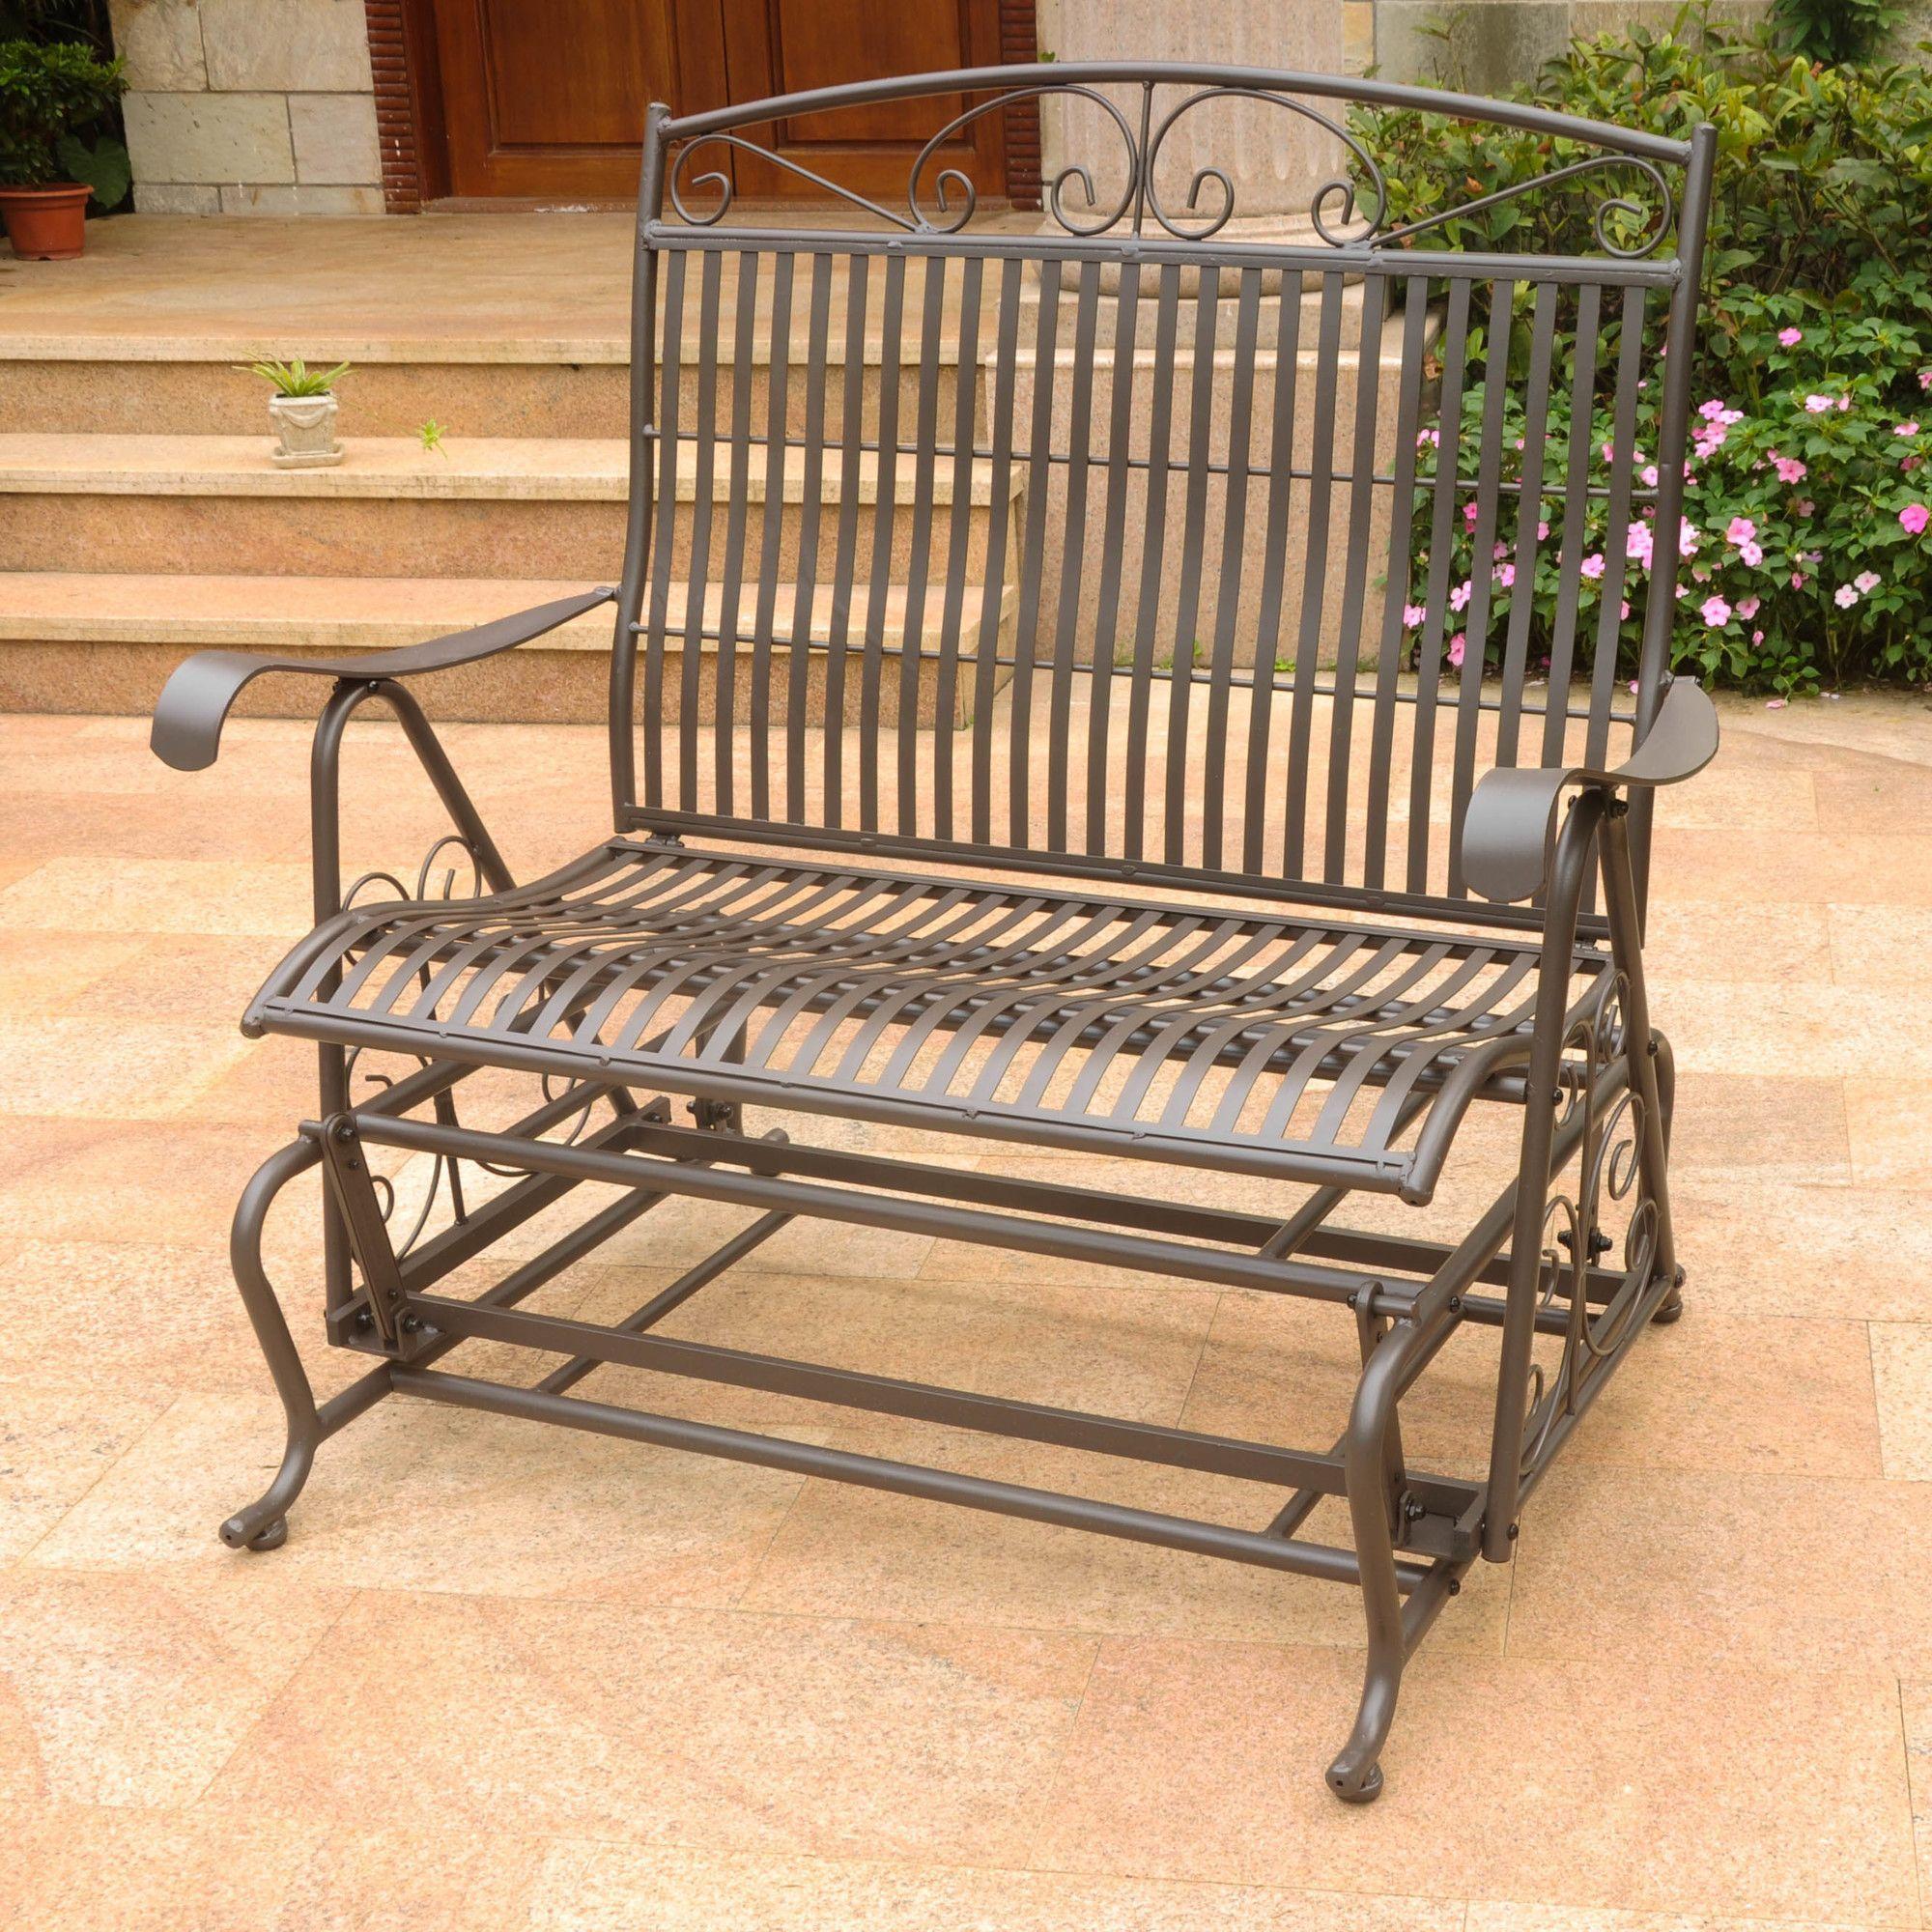 Rajesh Rocking Chair | Patio Glider, Outdoor Glider, Glider With Regard To 2 Person Antique Black Iron Outdoor Gliders (Image 25 of 25)